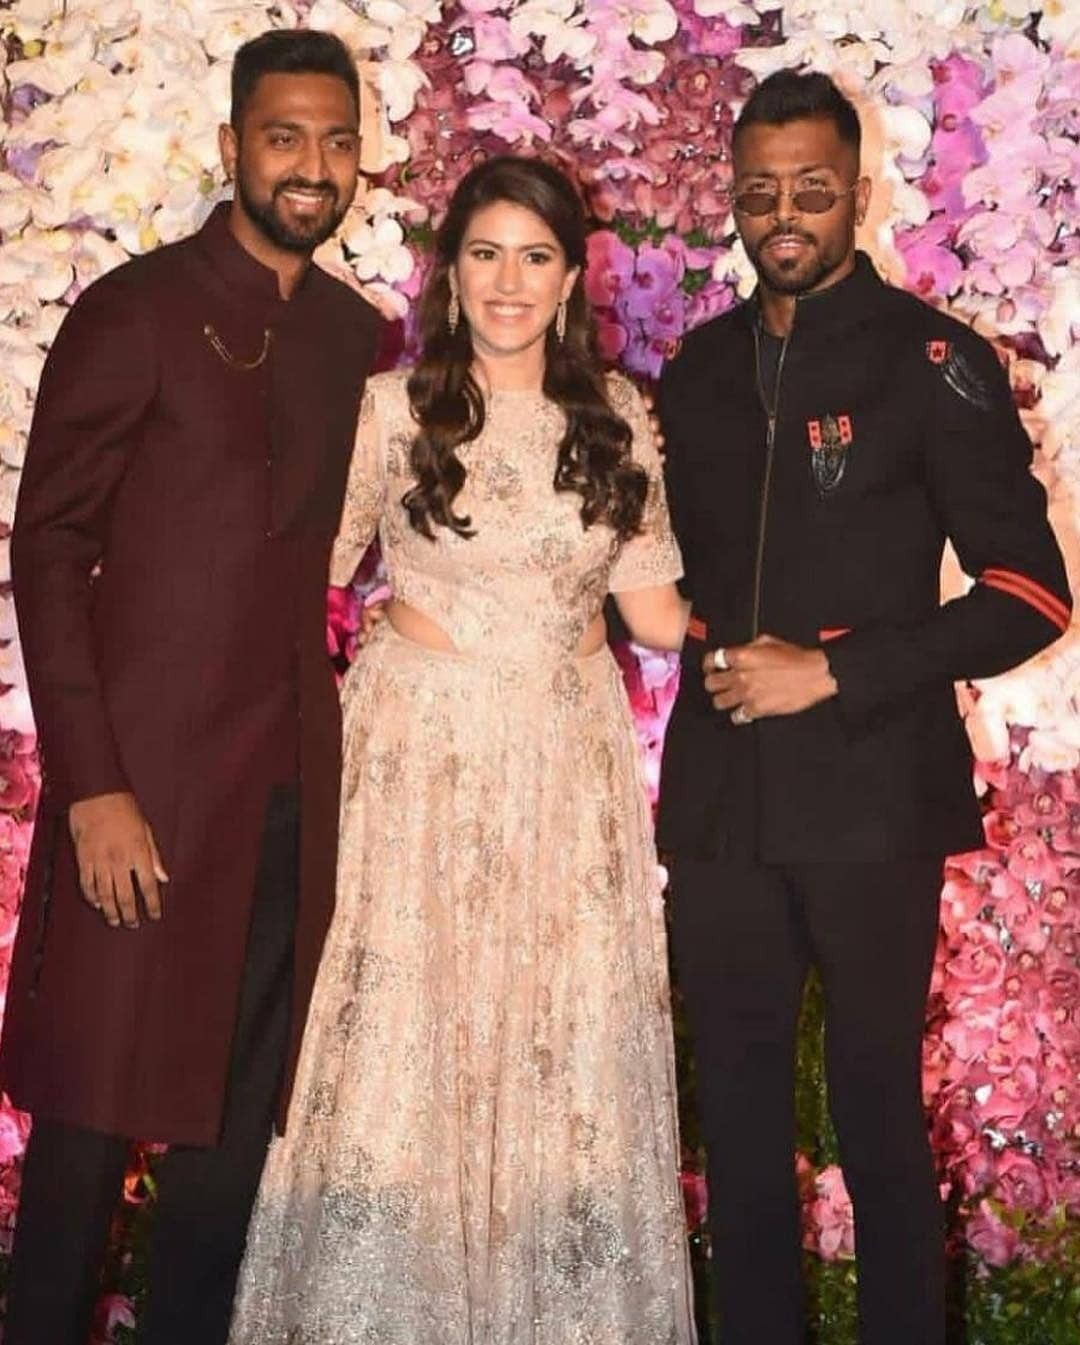 Krunalpandya Hardikpandya Arrives At The Wedding Party Of Akashambani And Shlokamehta In Mumba Bollywood Celebrities Celebrity Weddings Bollywood Fashion